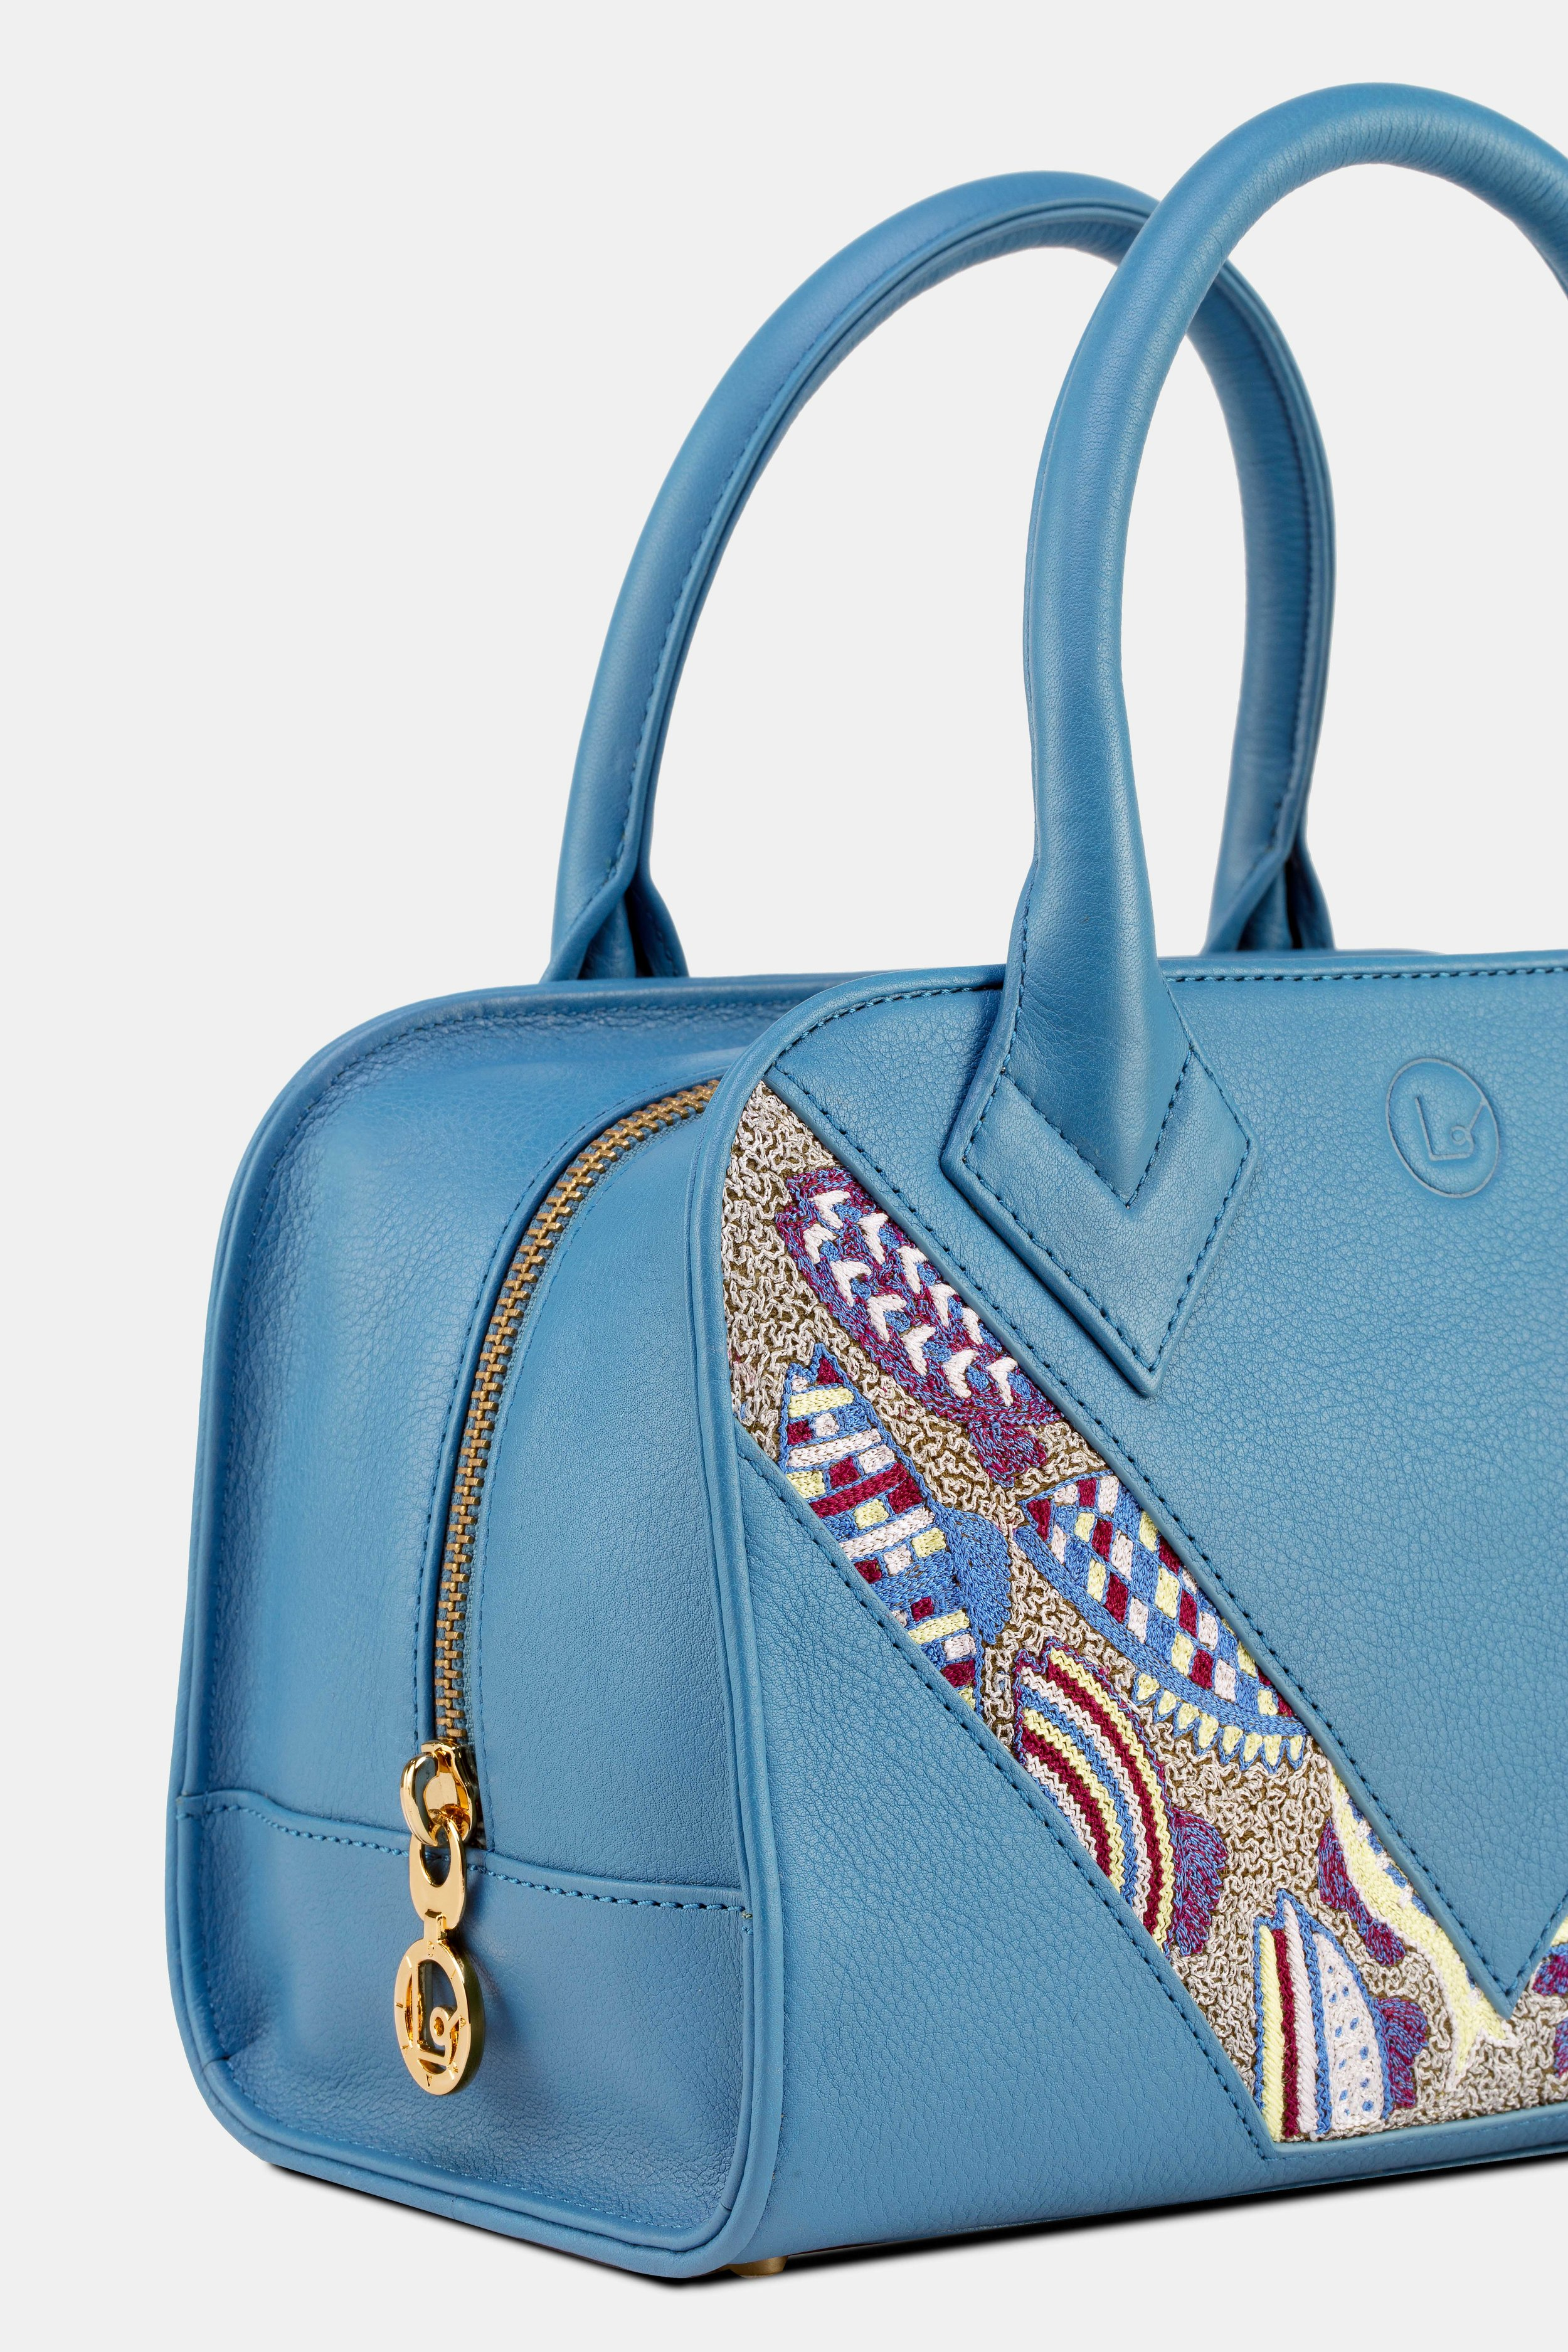 Diana Satchel French Blue